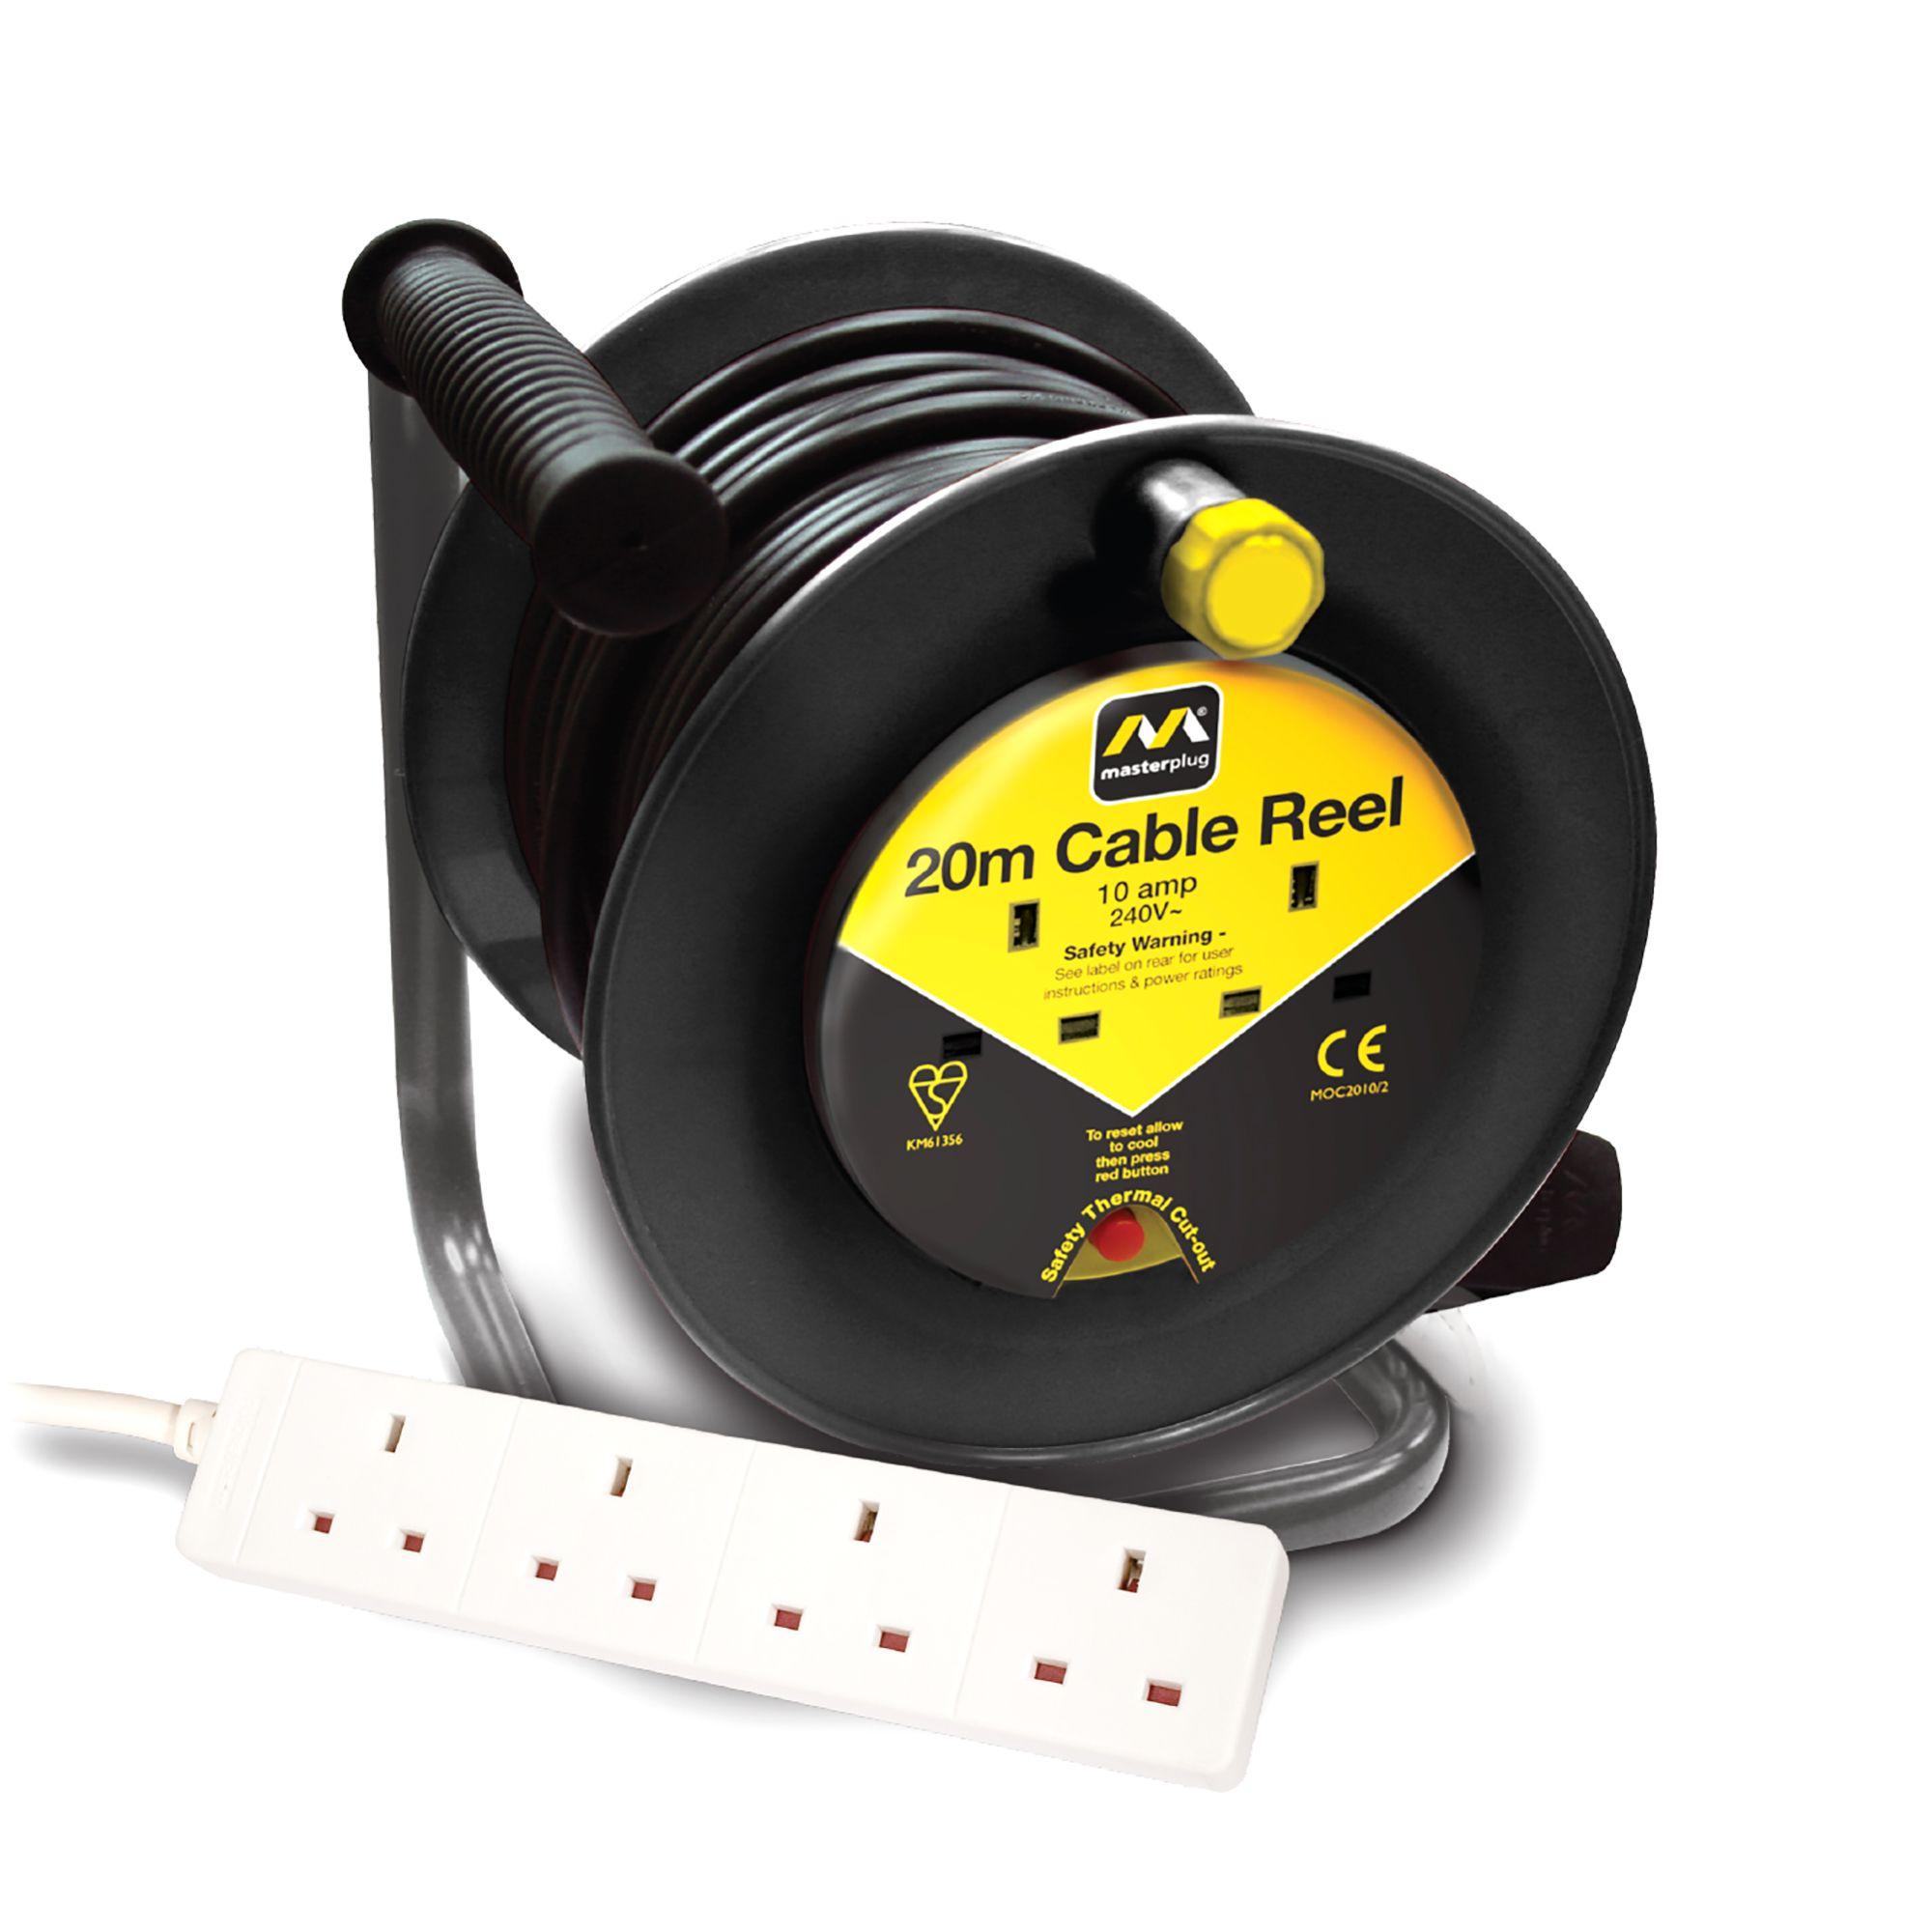 Masterplug 2 Socket 10a Cable Reel Amp Extension Lead L 20m